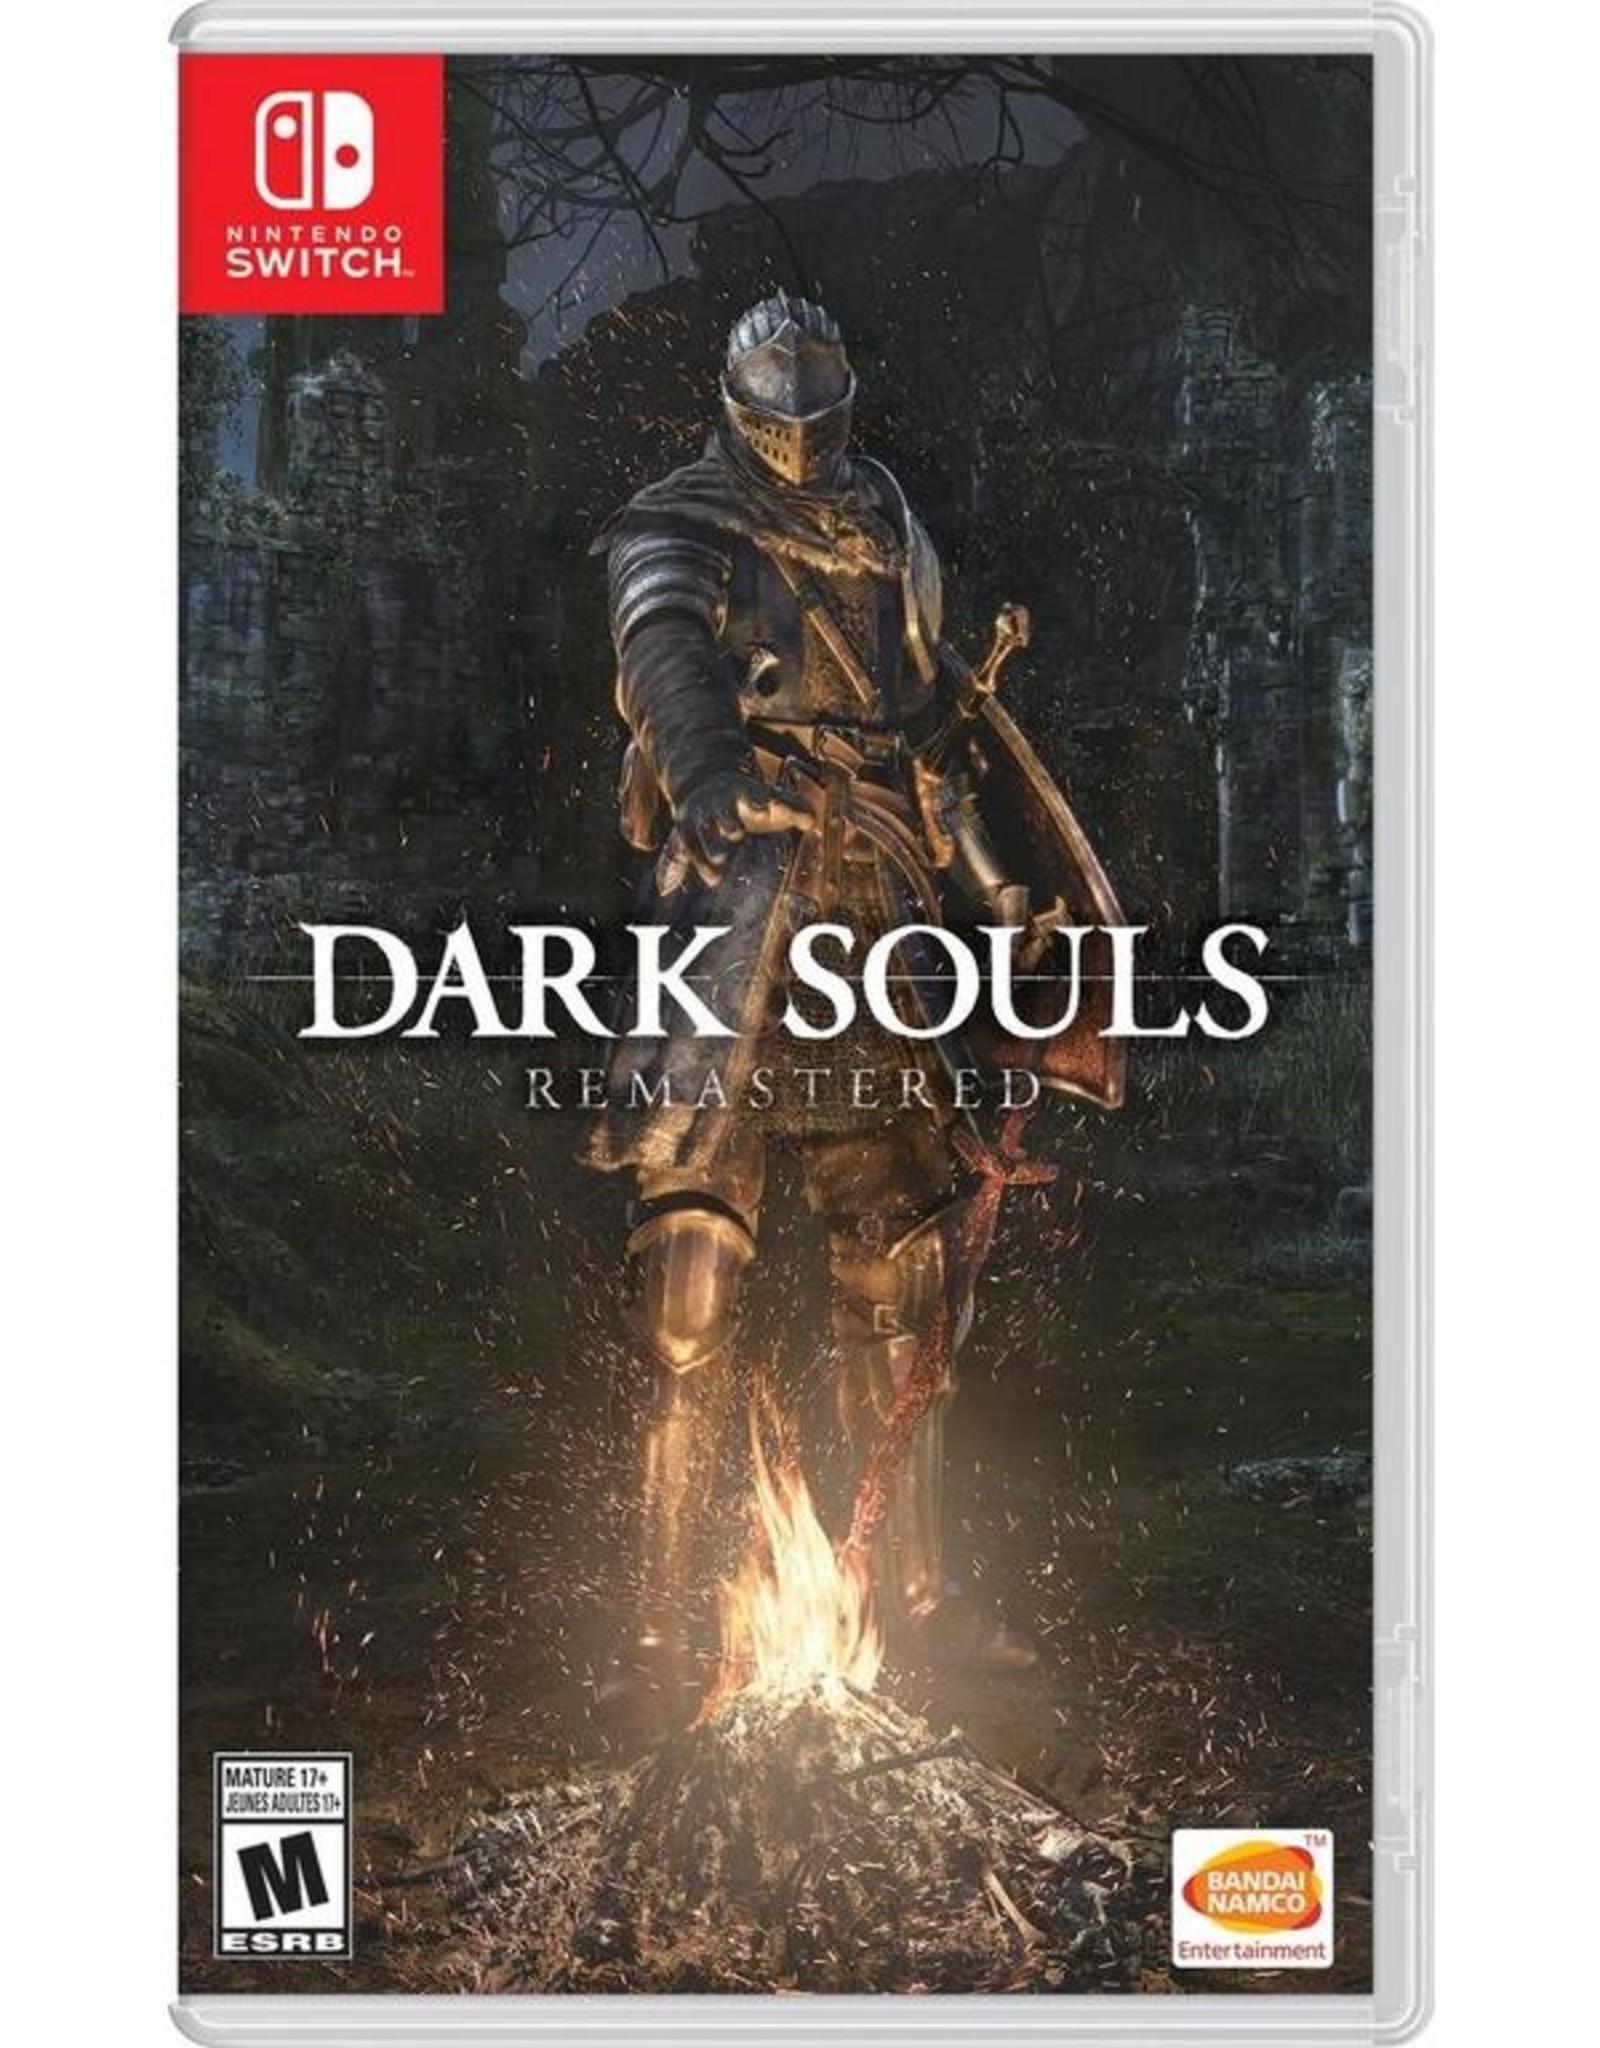 Dark Souls Remastered - SWITCH Preplayed